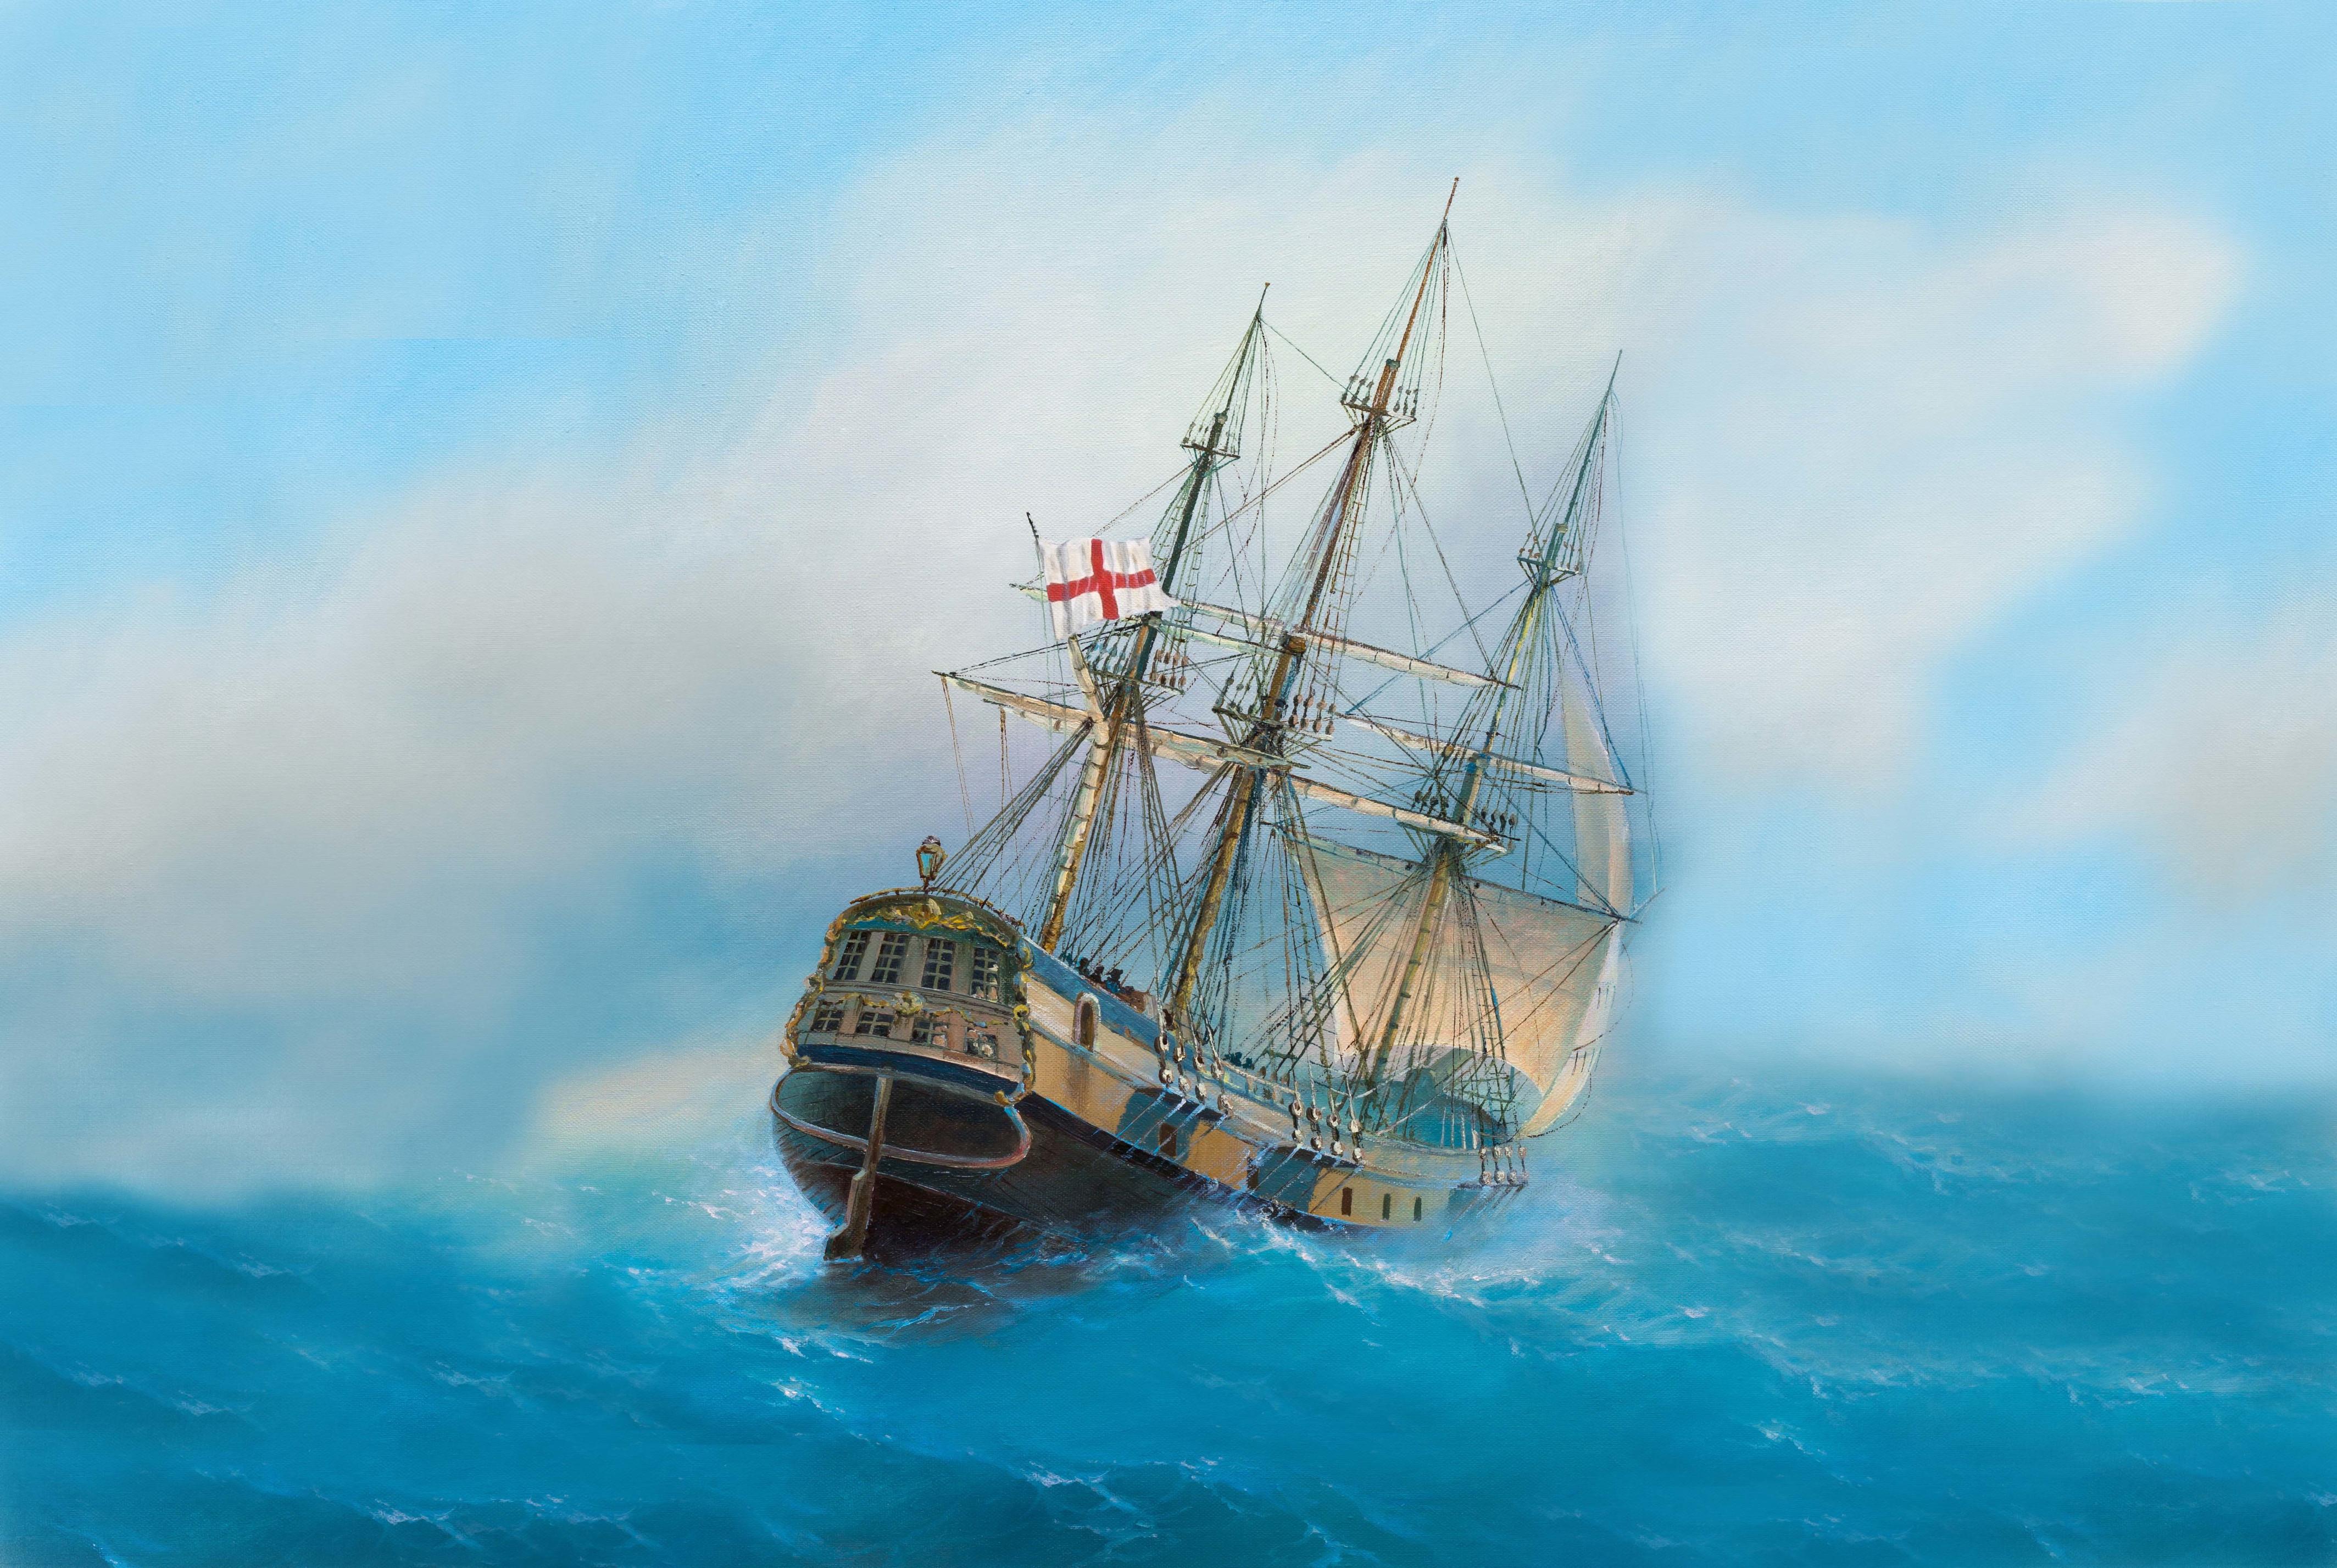 General 4254x2854 flot painting ocean battle classical art sea artwork vehicle ship